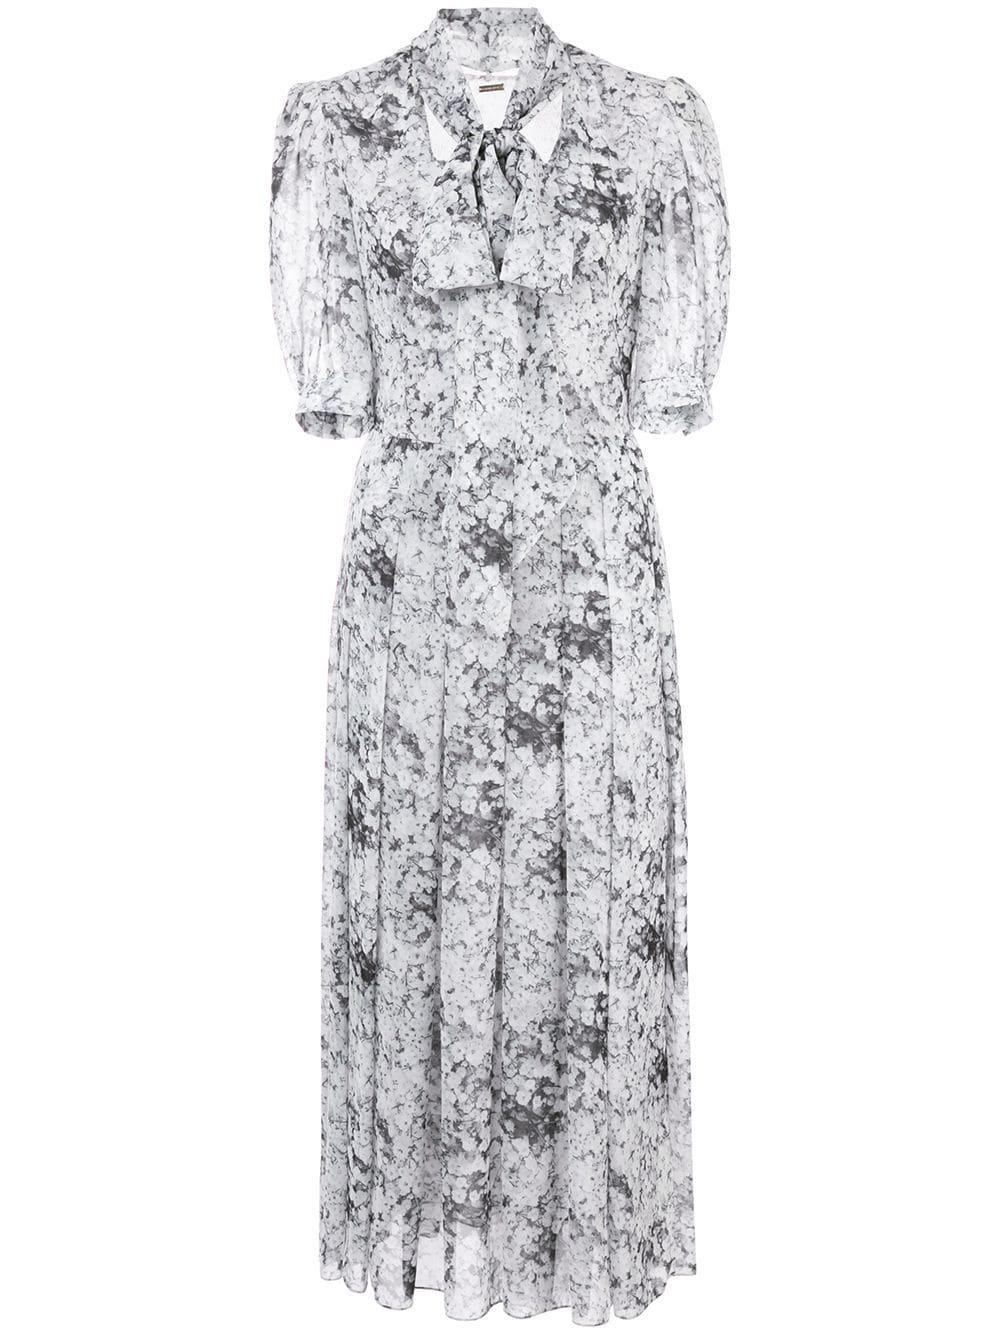 Elbow Sleeve Baby's Breath Print Dress Item # R20710PB